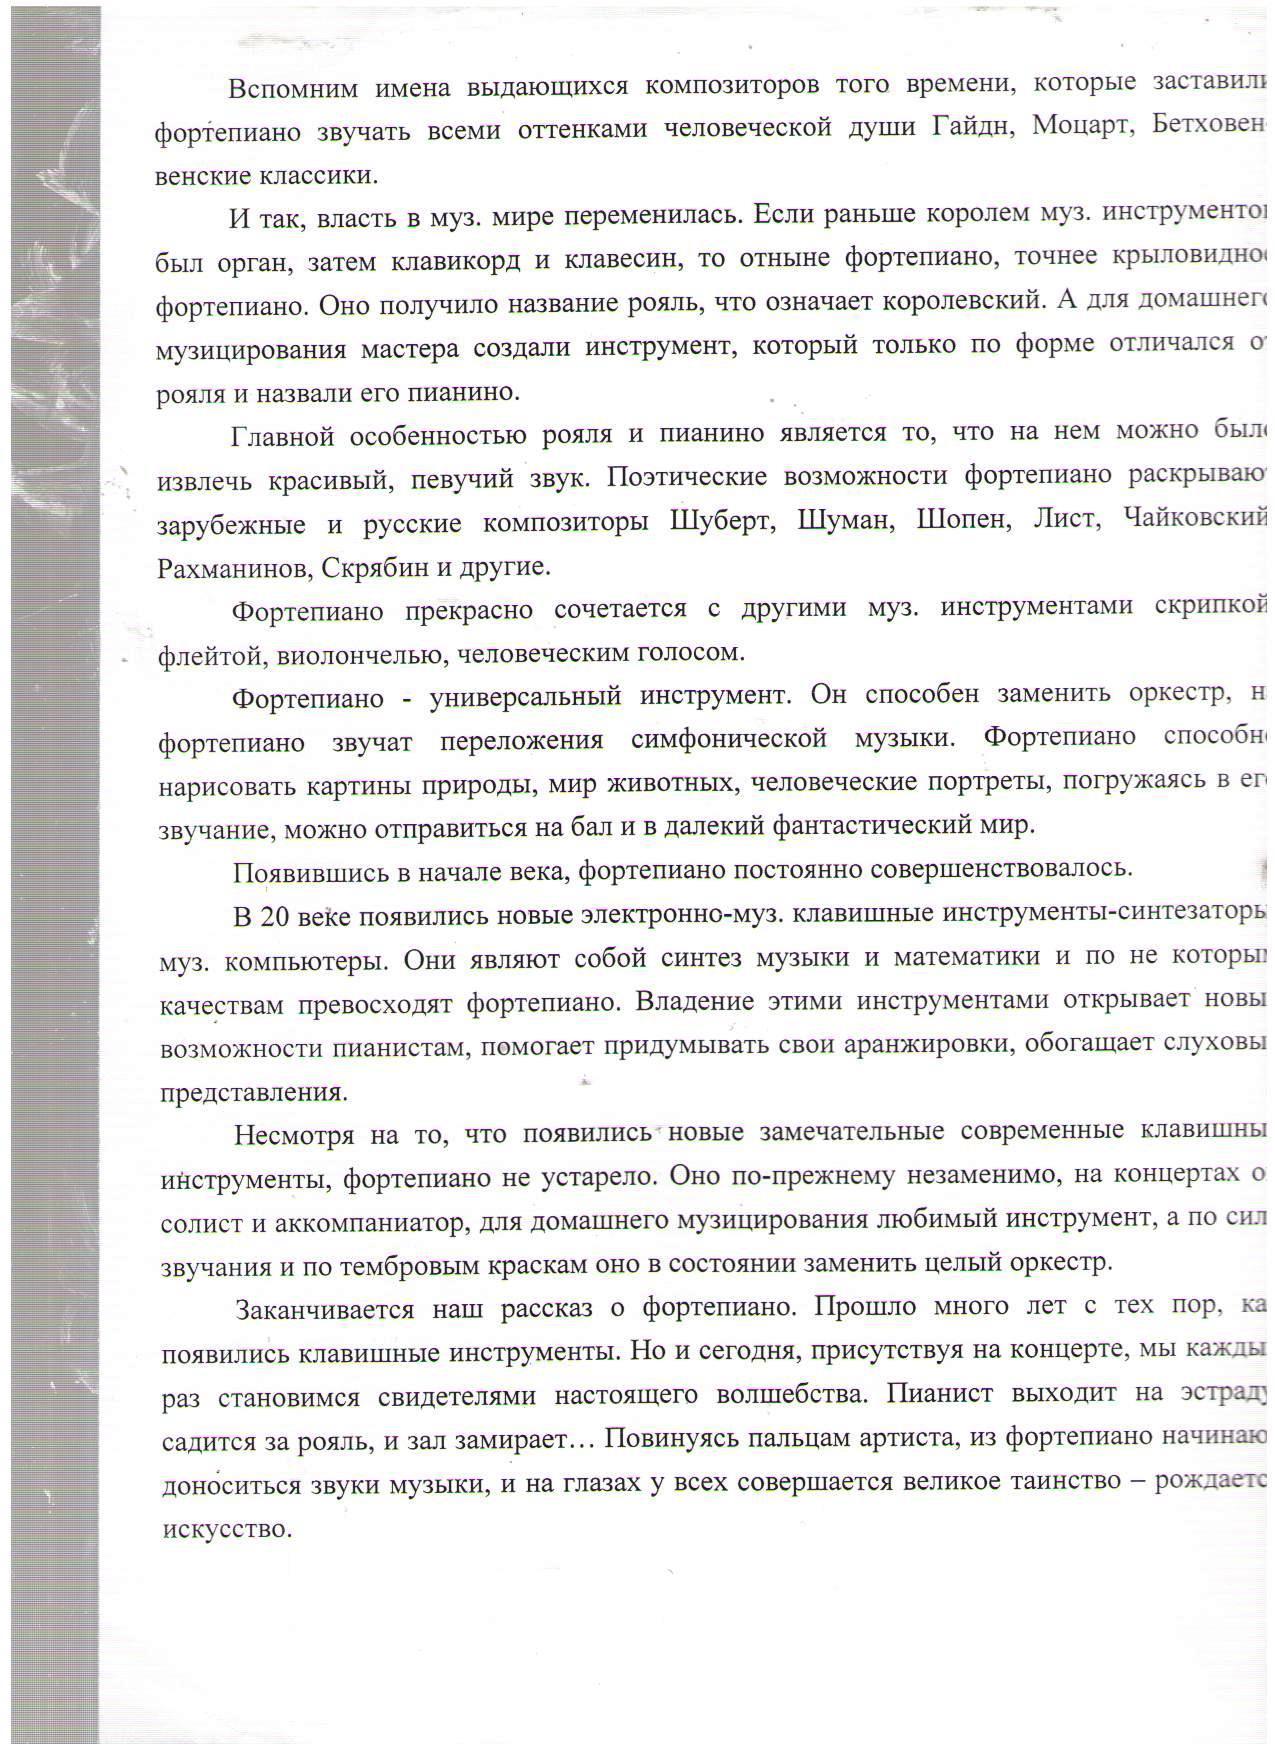 C:\Users\Нина\Desktop\Пономарева\внекл4 003.jpg